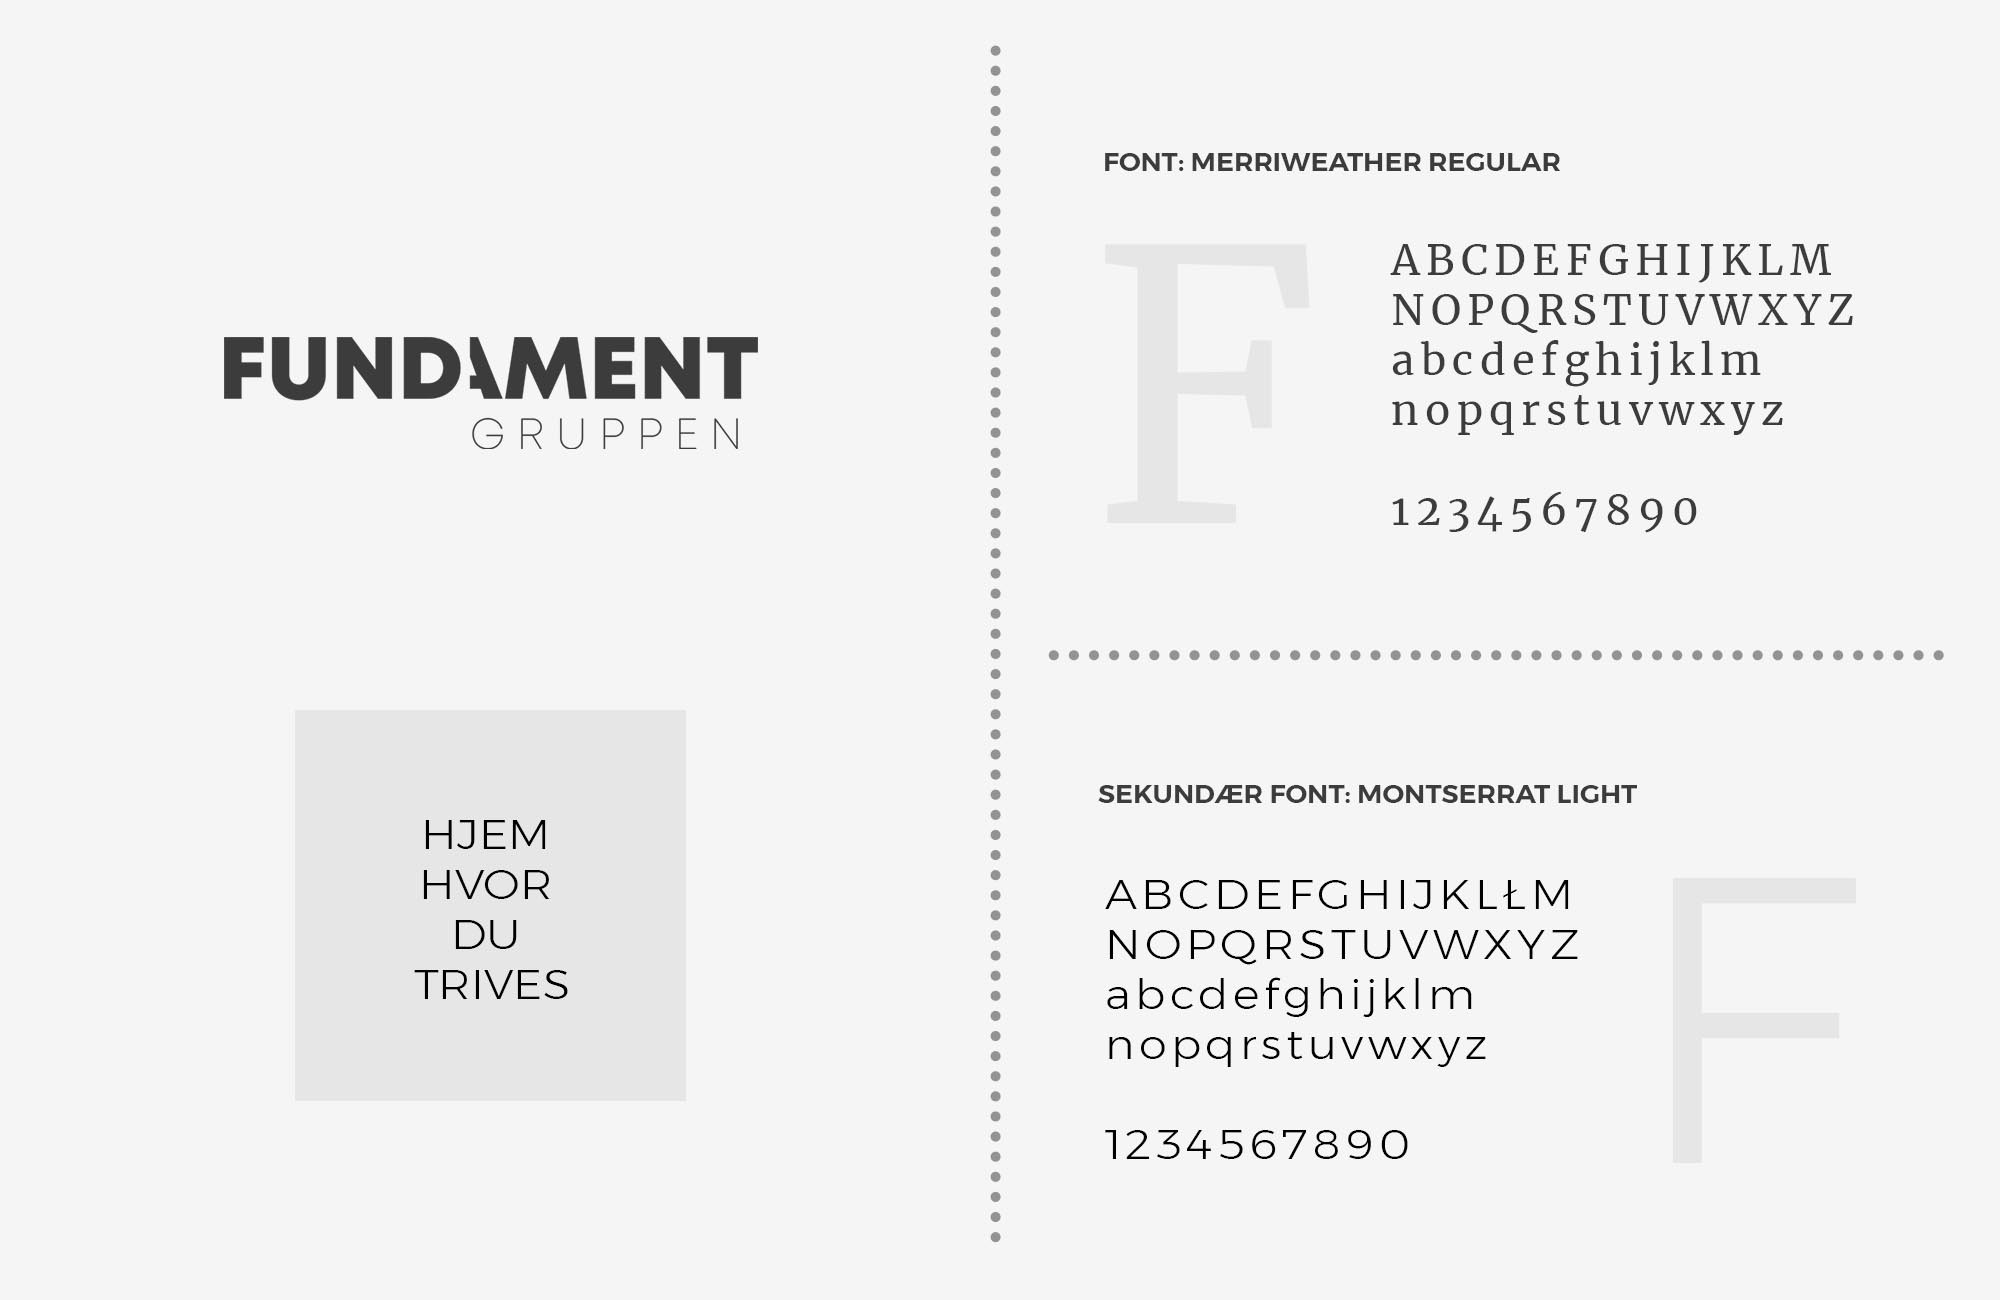 fundament_FONT_1.jpg